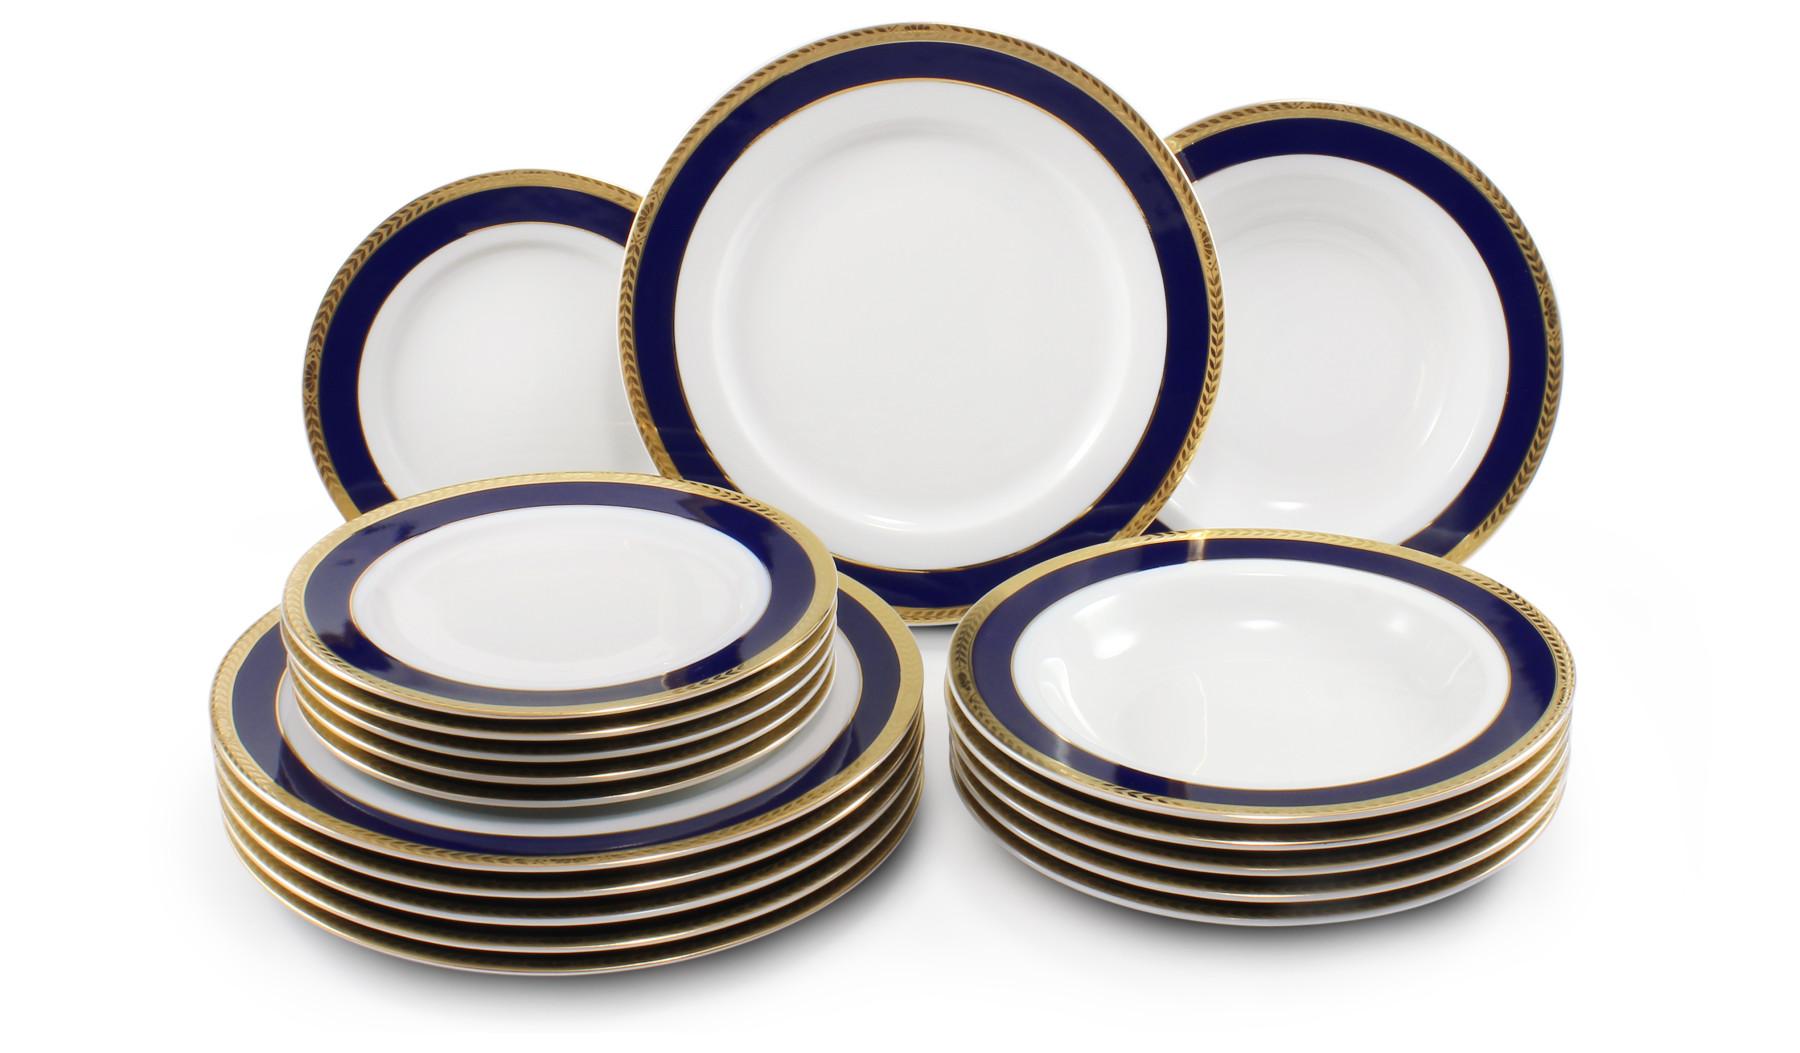 Plate set 18-piece- Cobalt and gold braid